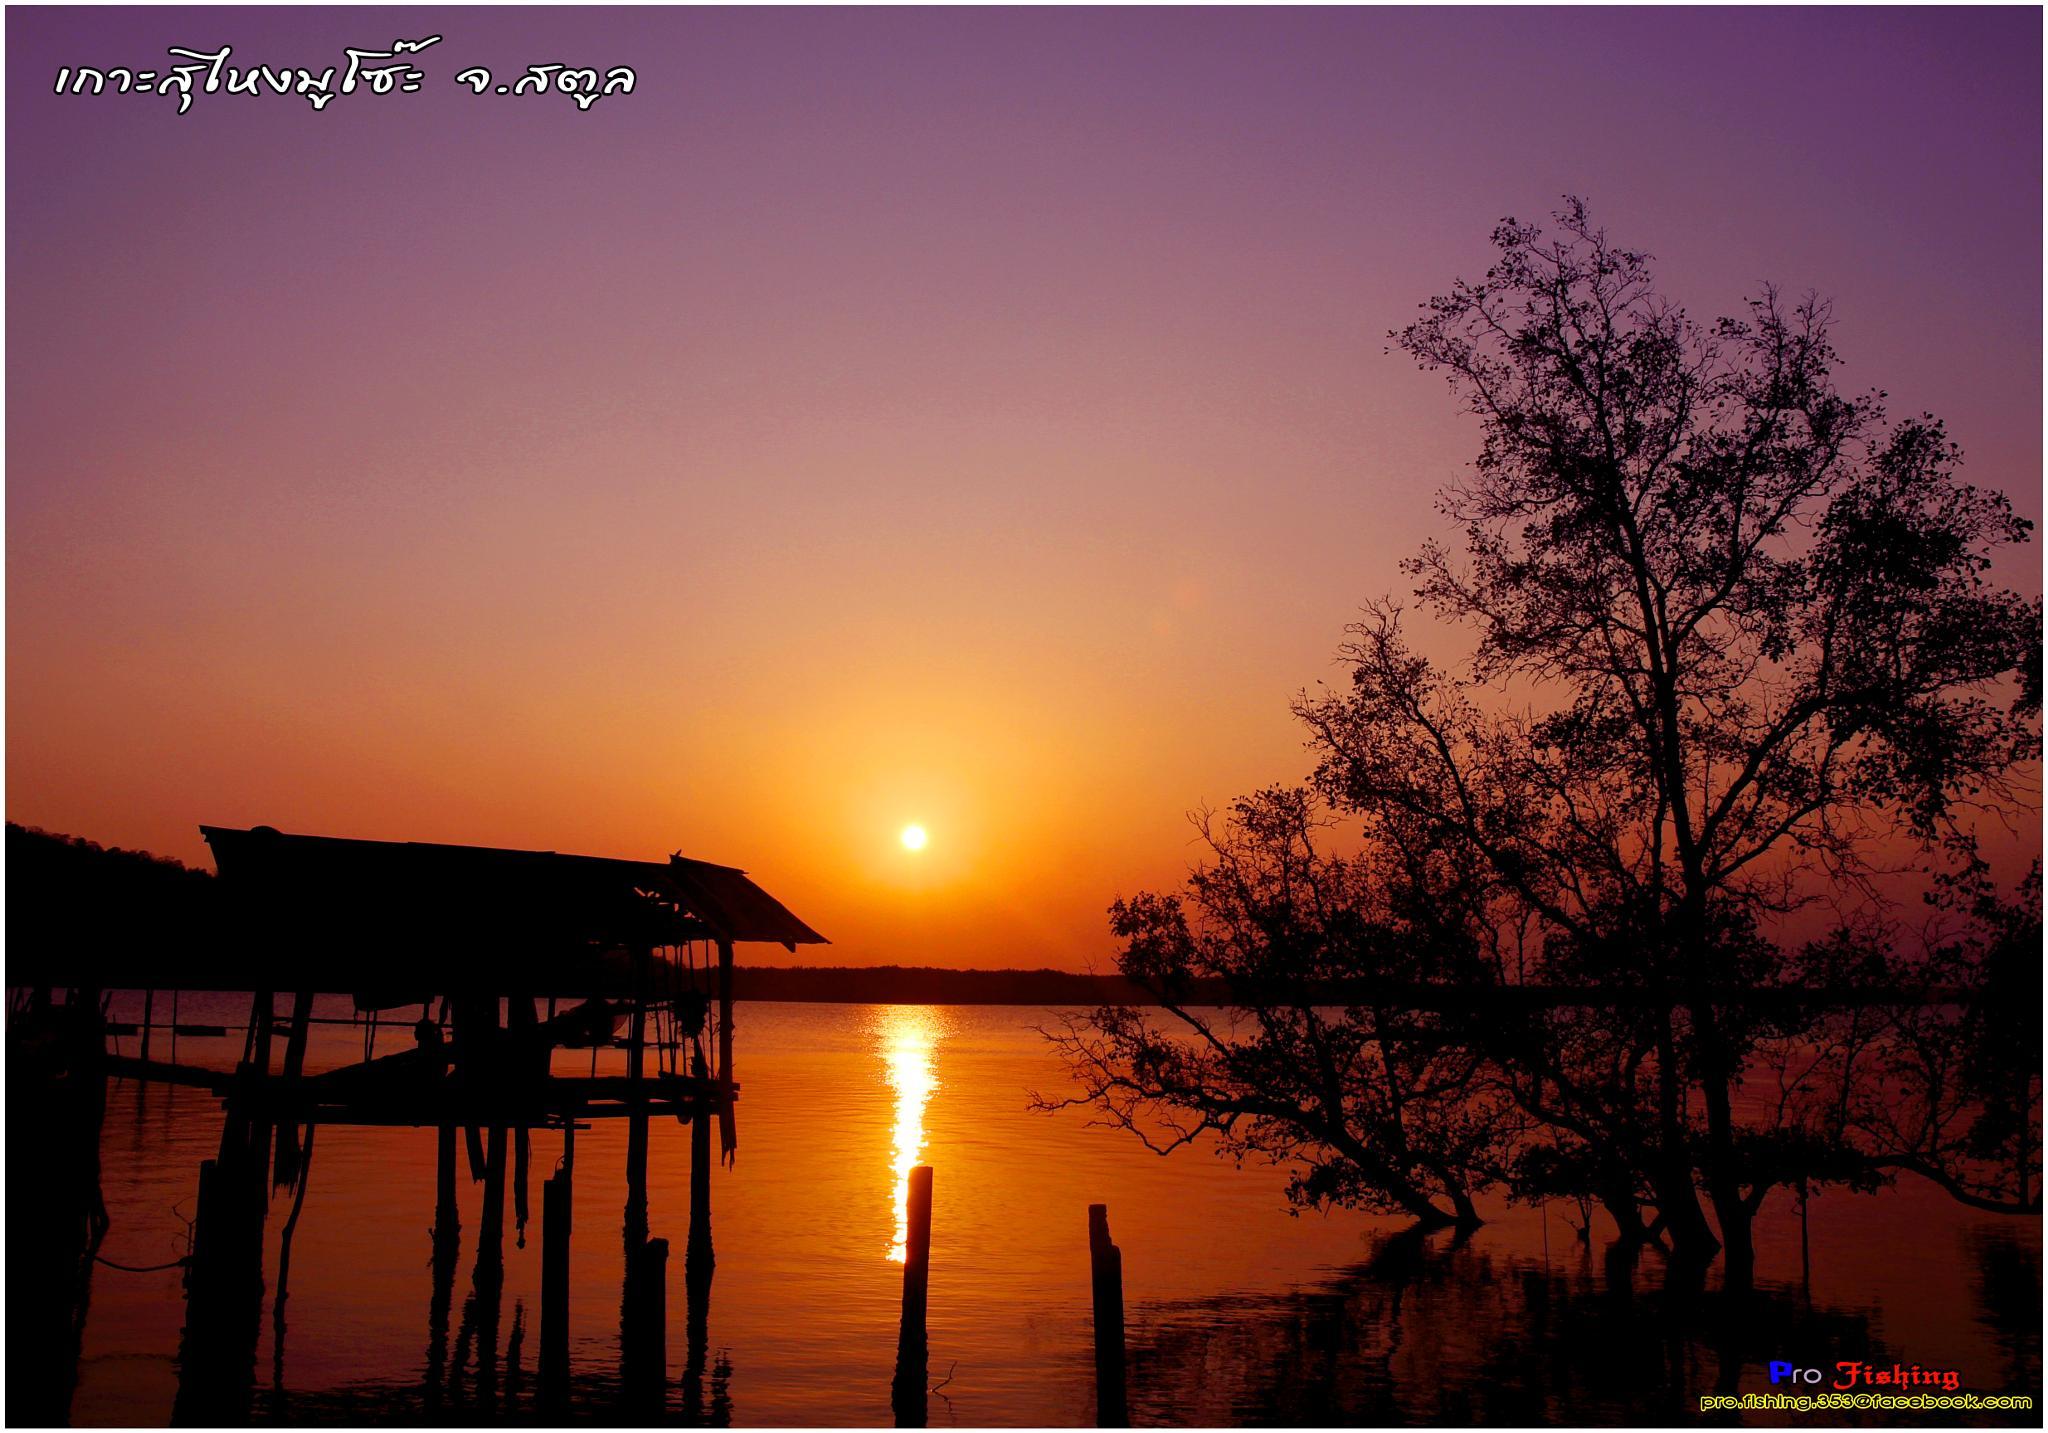 Sungaimusoh Village  by Pro Fishing Photographer